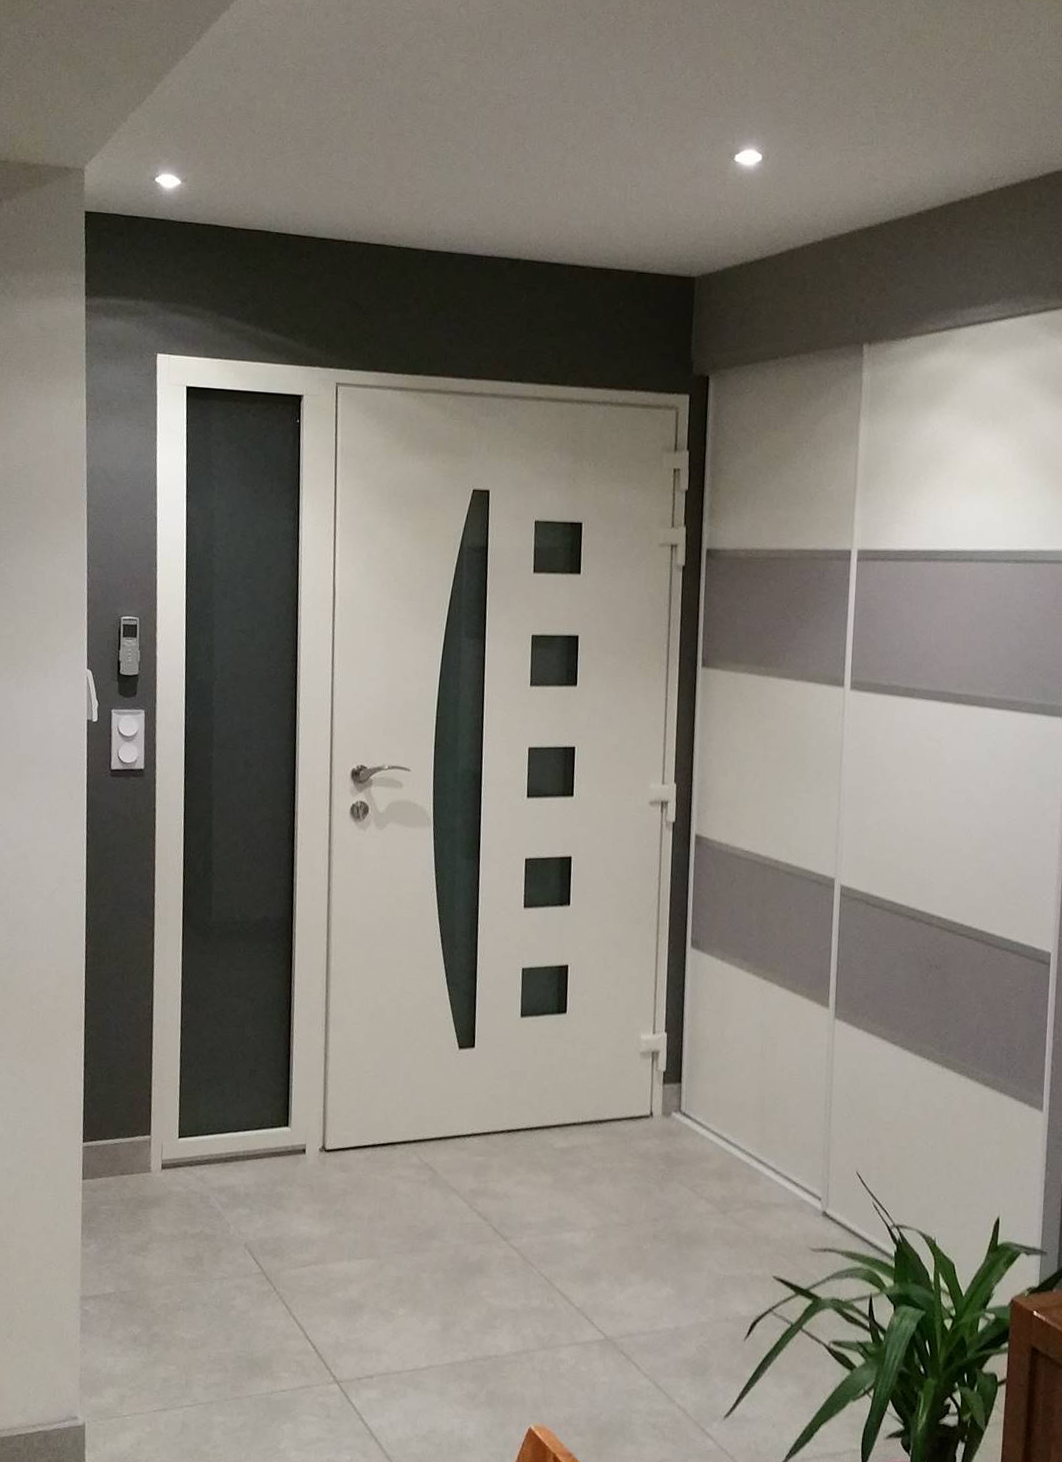 peyon menuiserie porte d 39 entr e. Black Bedroom Furniture Sets. Home Design Ideas